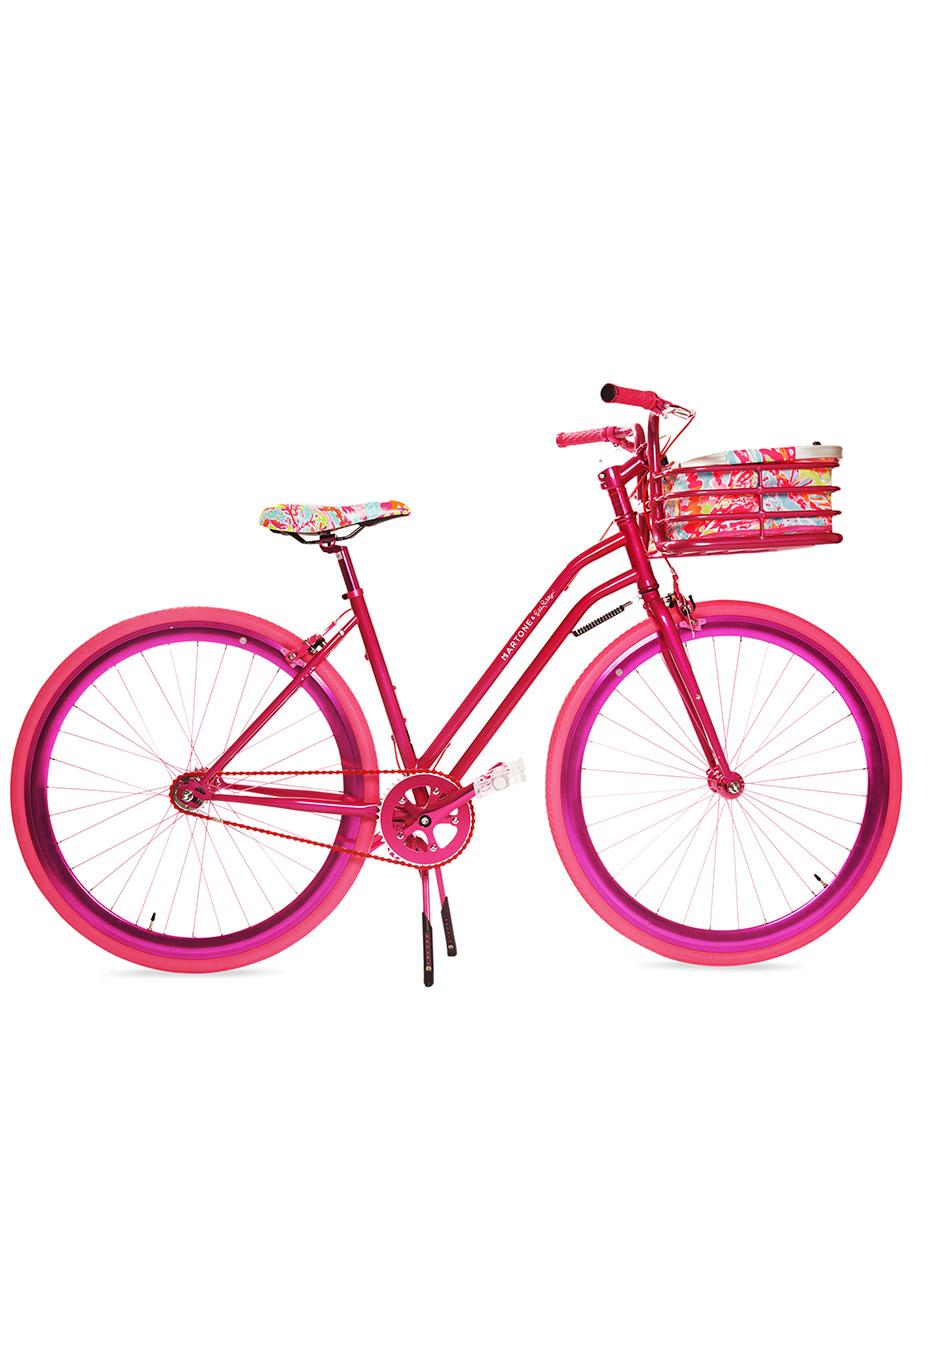 Martone Cycling Co. Bicycle